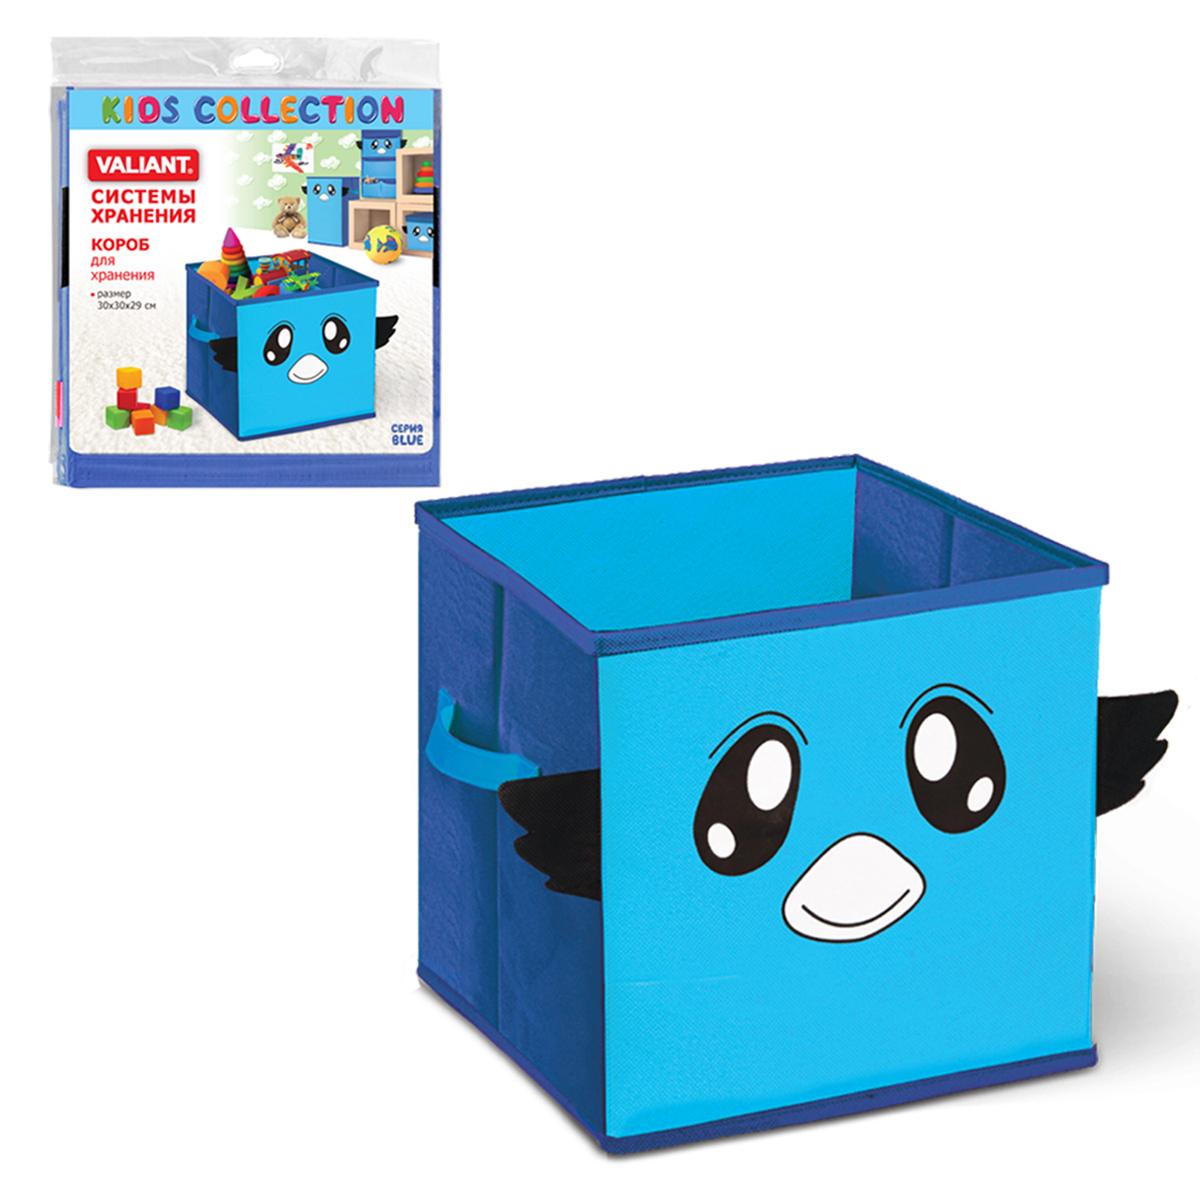 VAL BLU-05 Короб для хранения, 30*30*29 см, цвет: синий